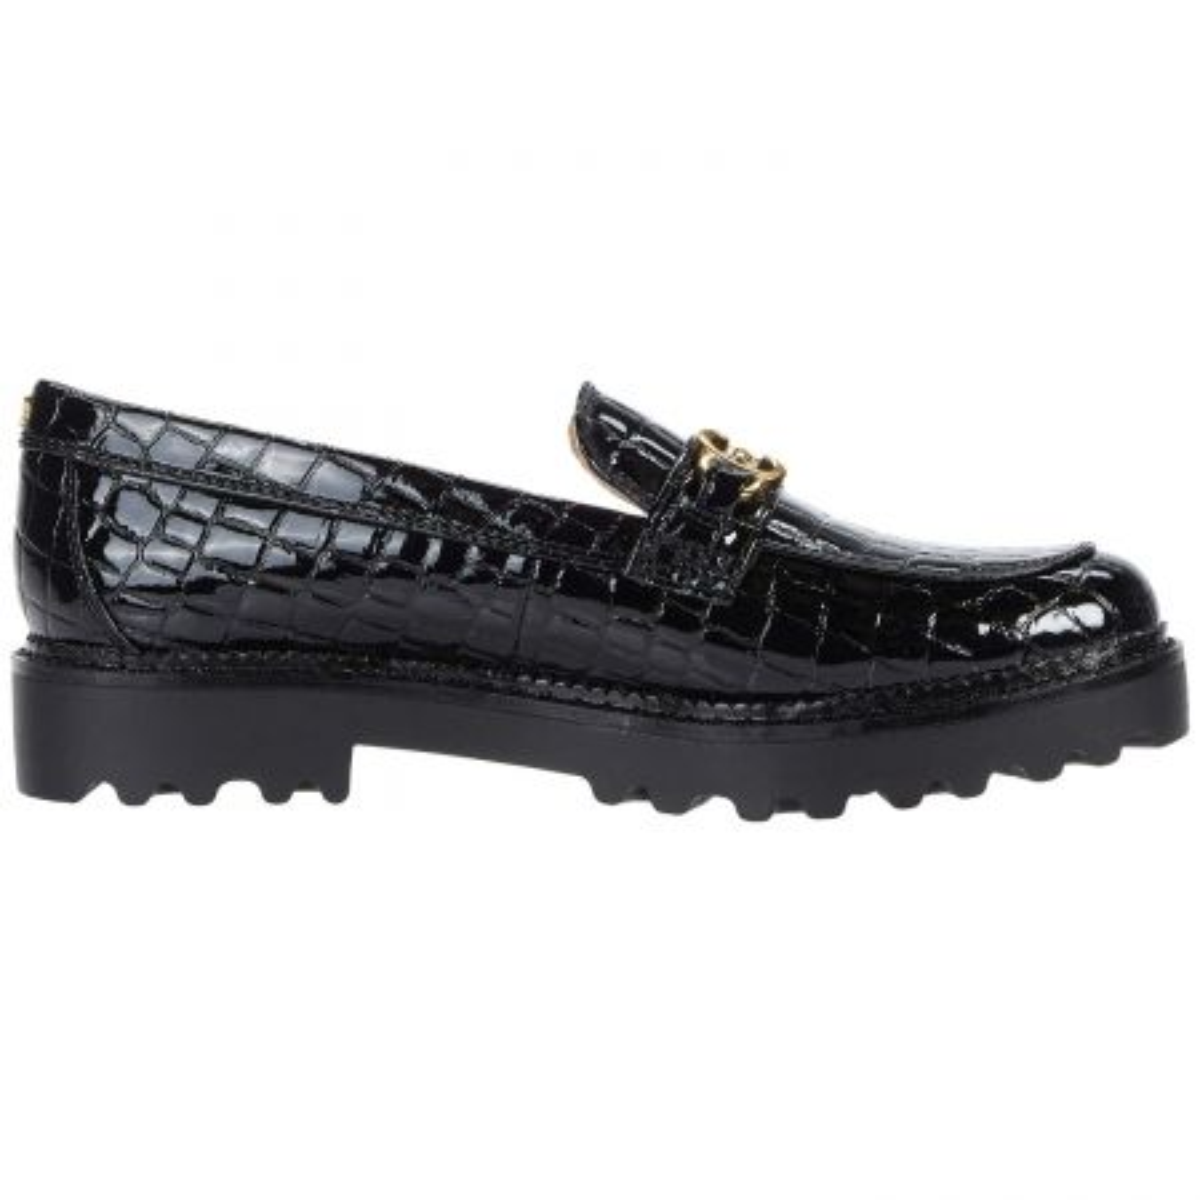 Circus Deana cipele